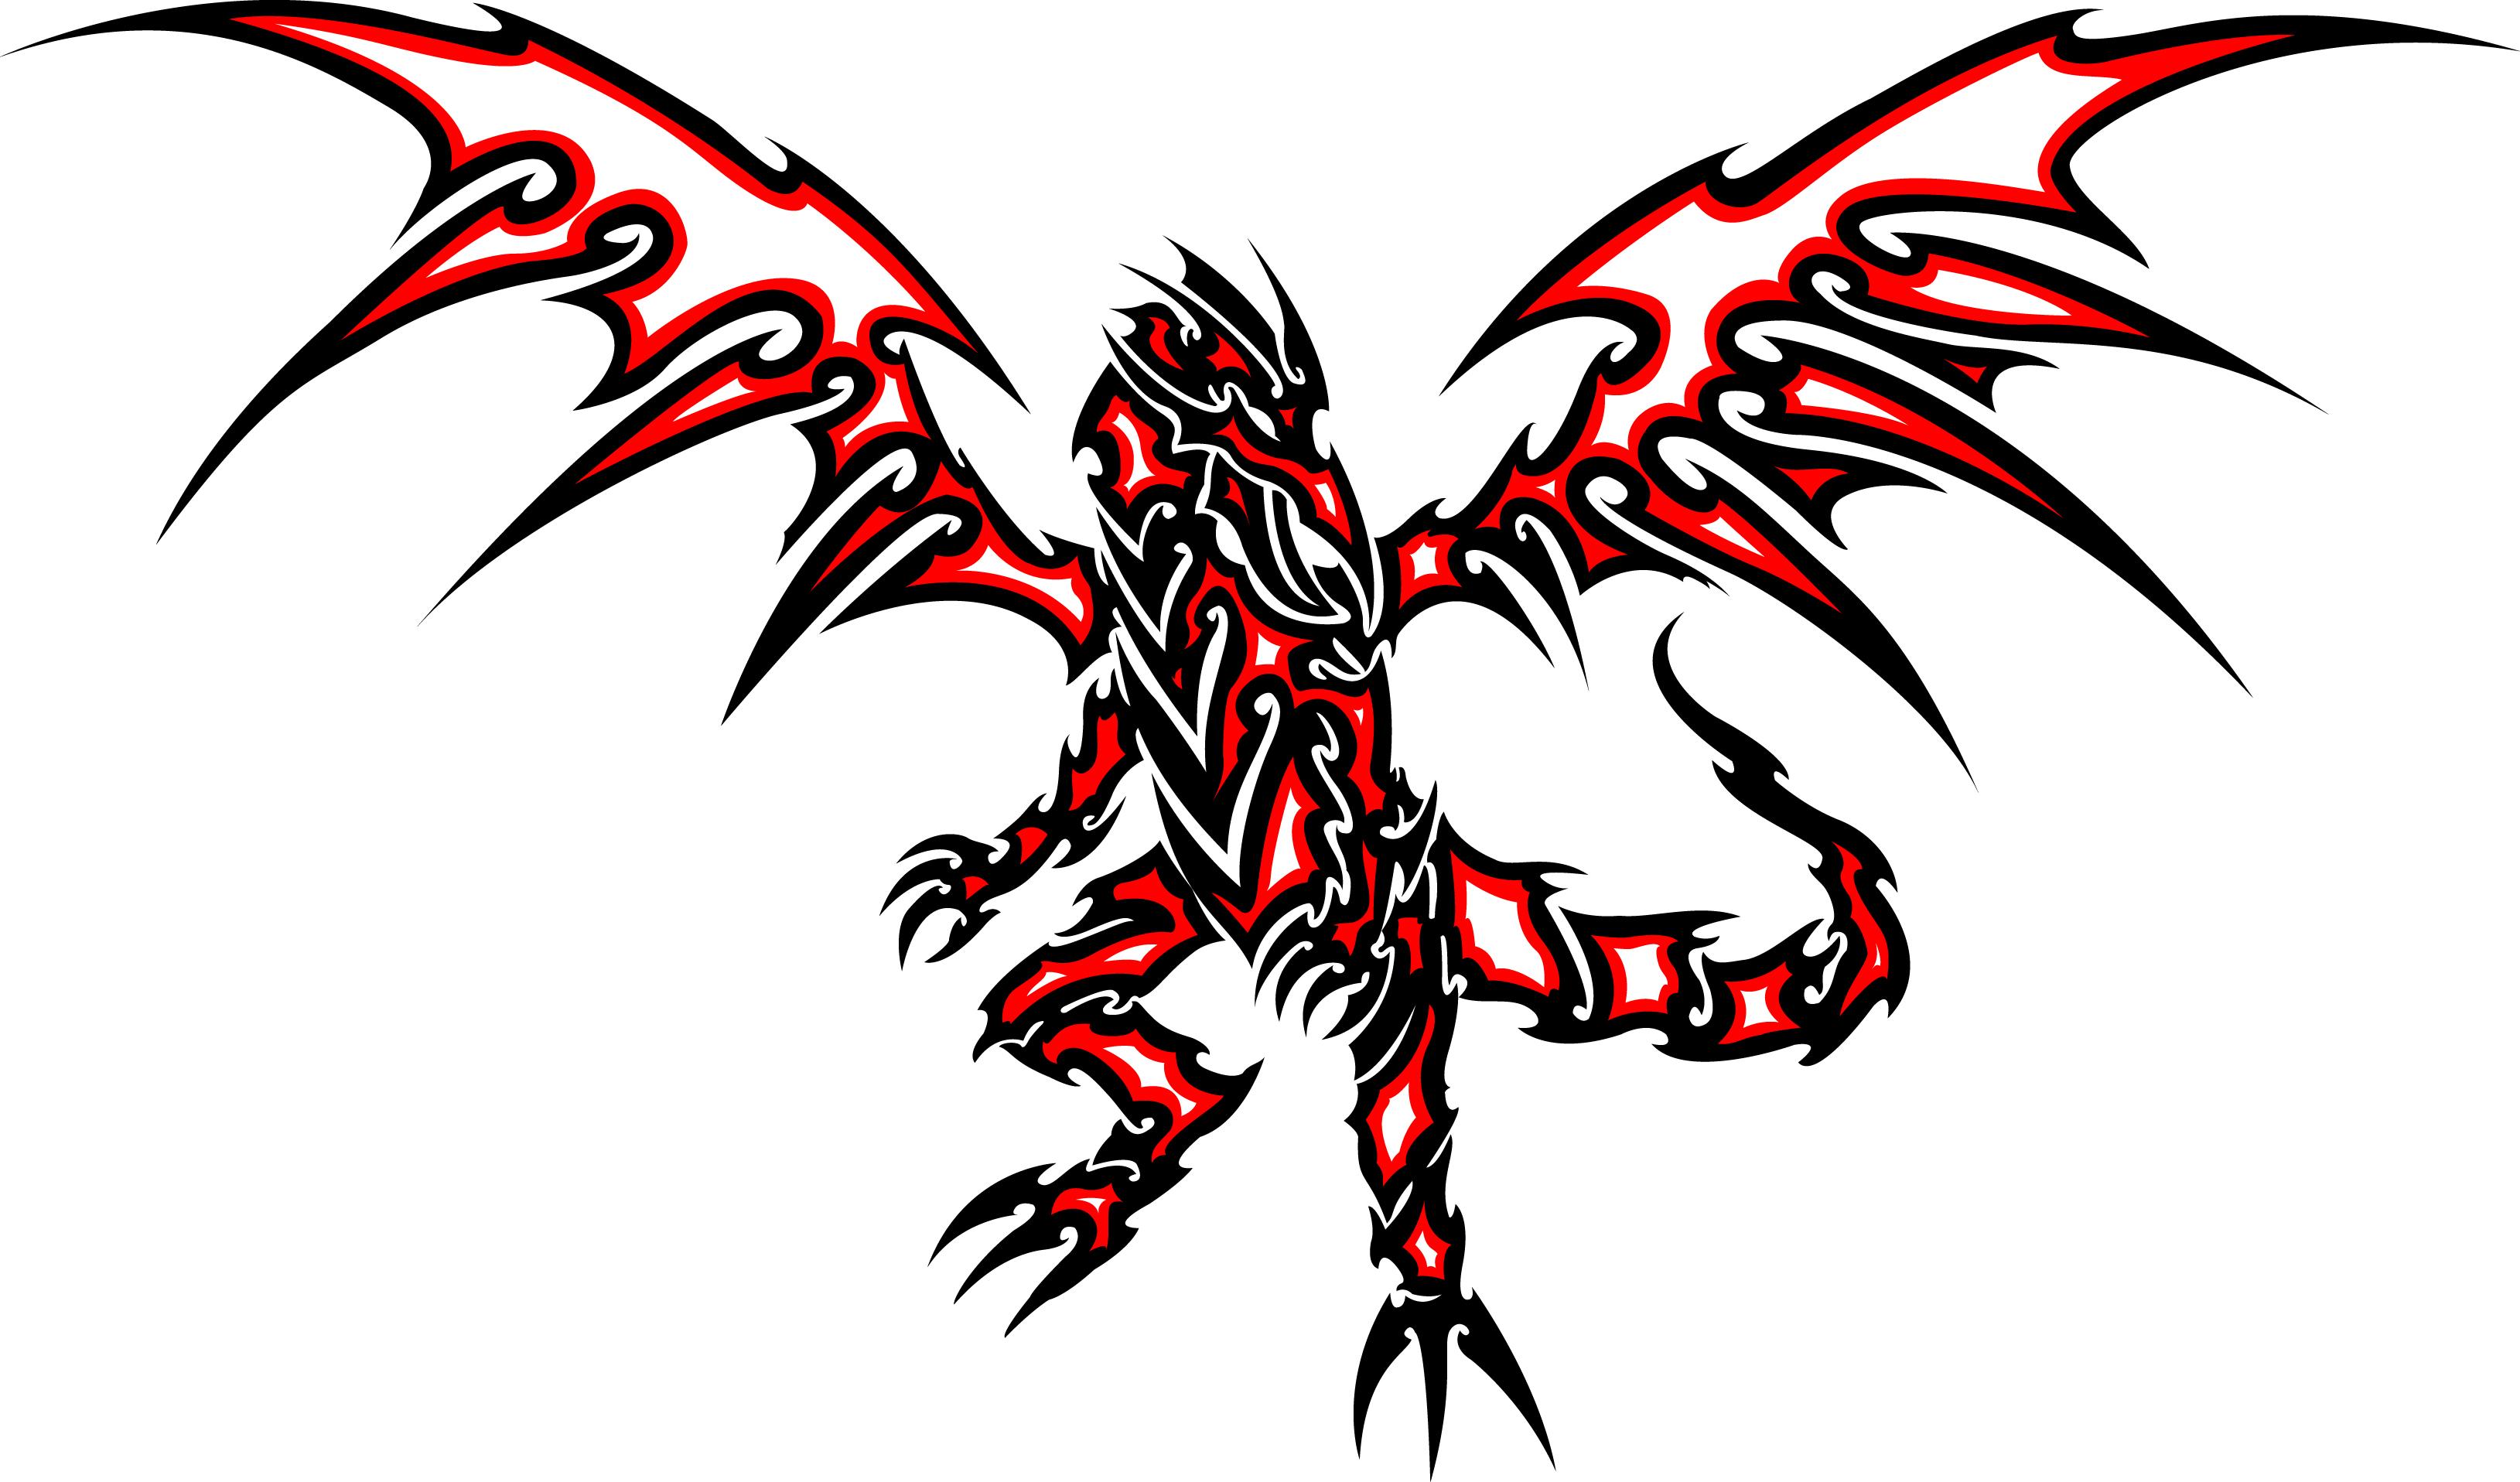 Red-Eyes Black Dragon Tattoo by MalcoLXX on DeviantArt